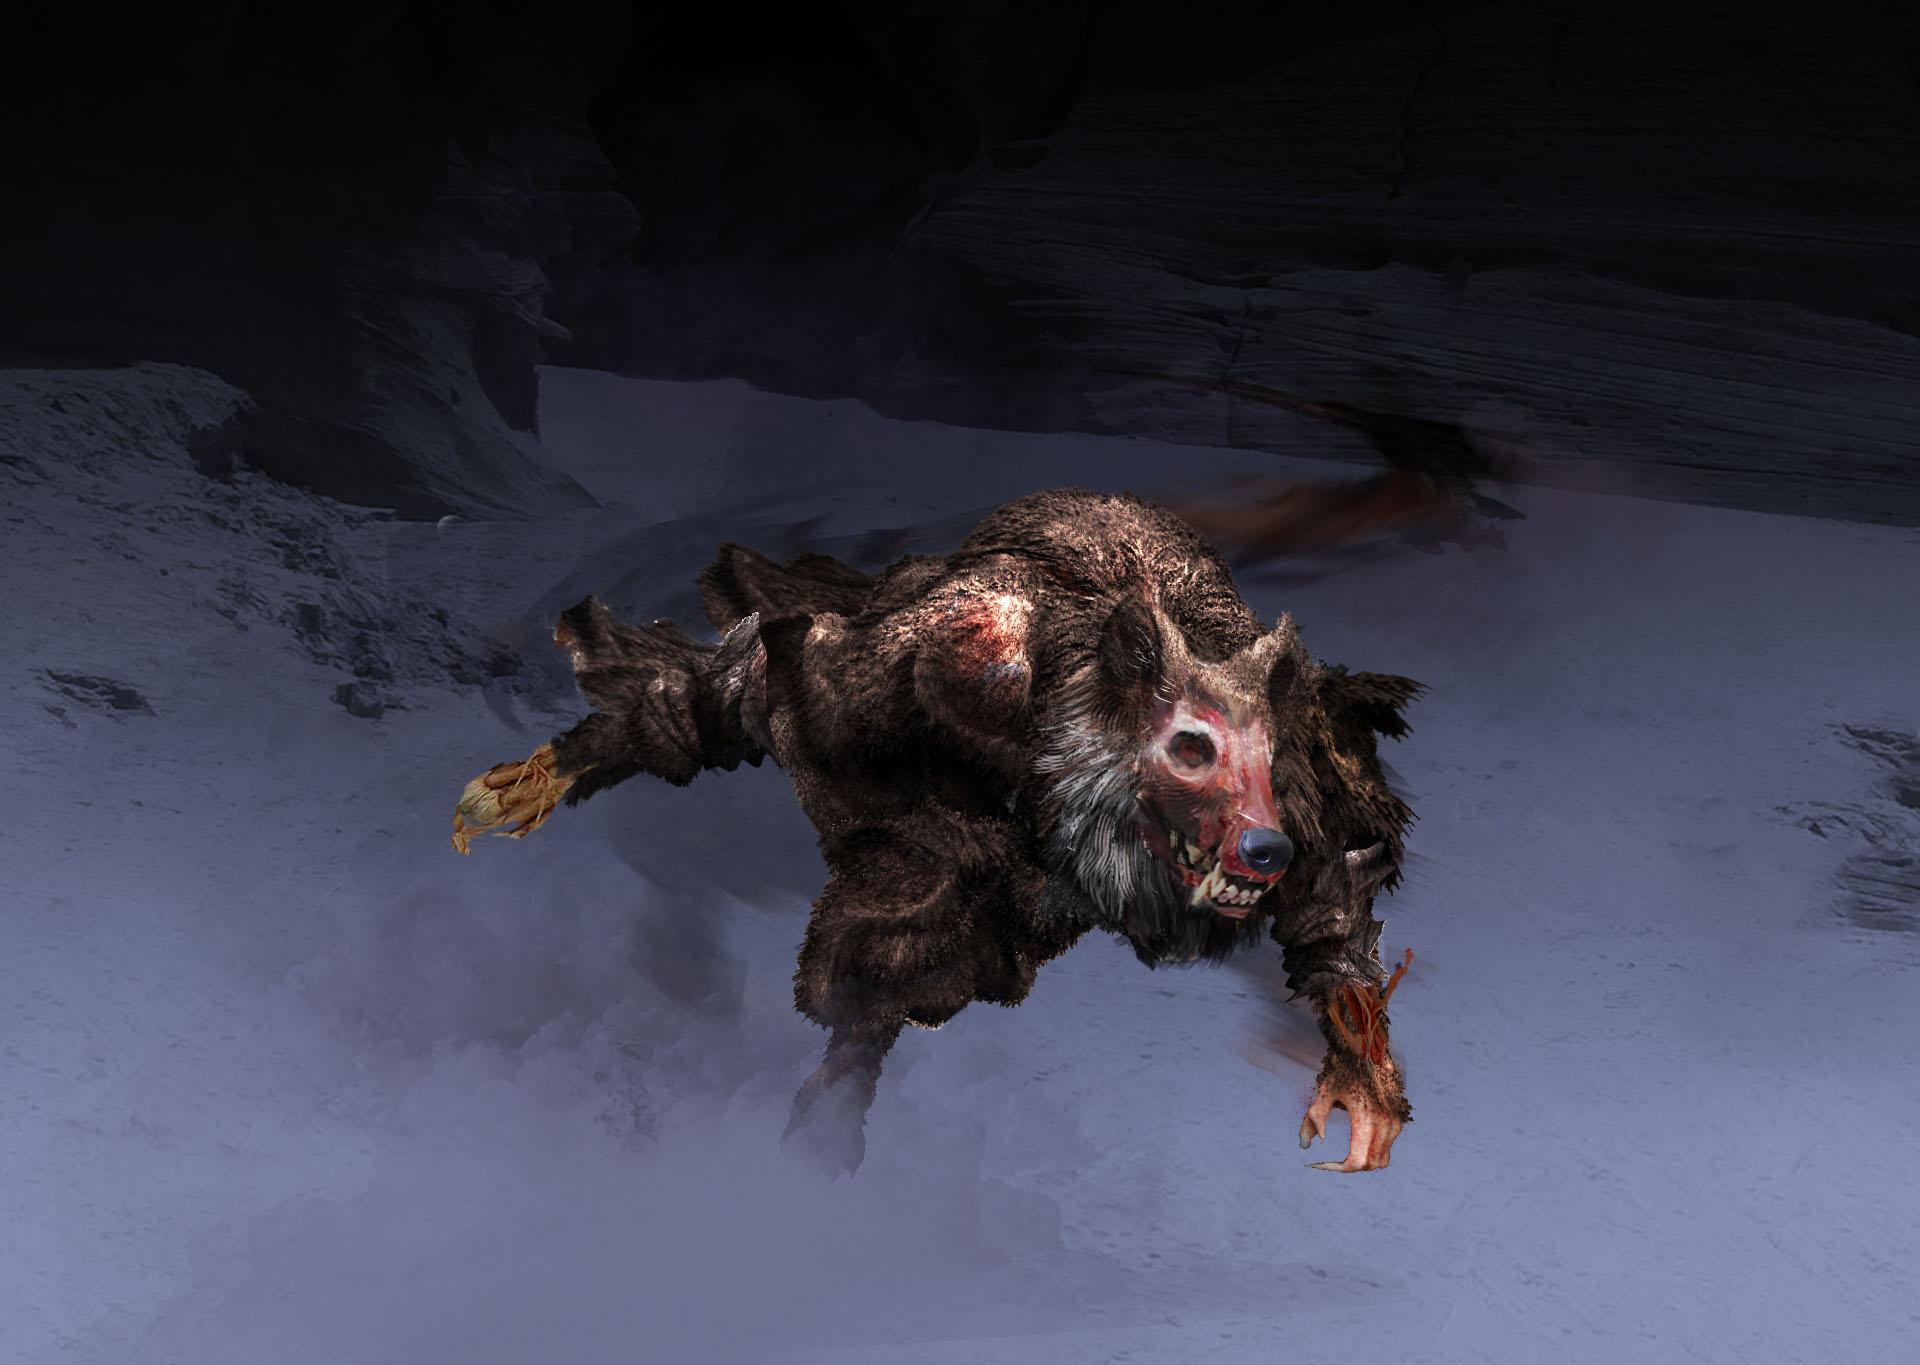 skinwalker attack_highspeed.jpg